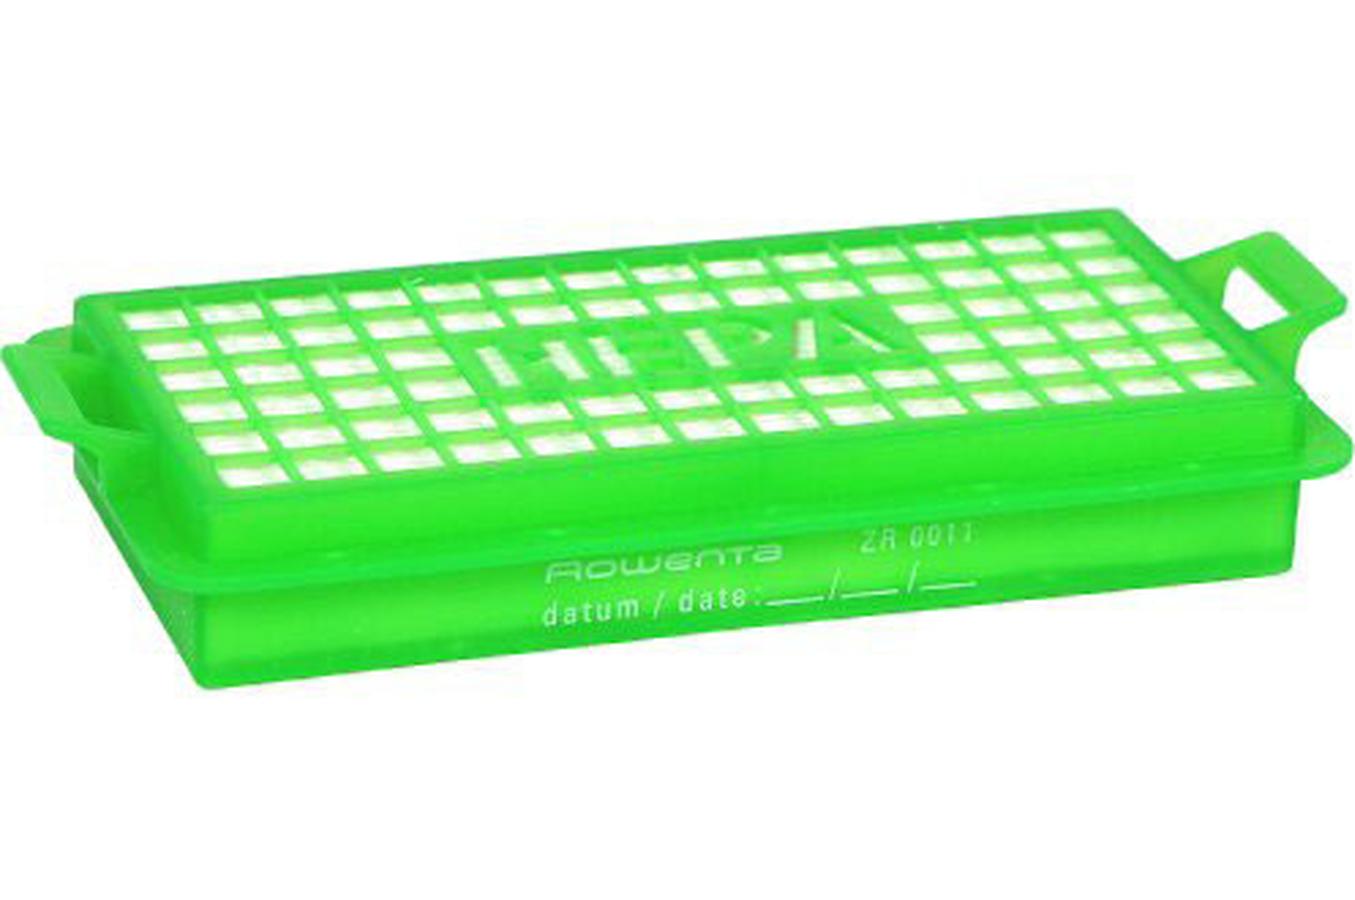 filtre pour aspirateur rowenta zr0011 1076930 darty. Black Bedroom Furniture Sets. Home Design Ideas